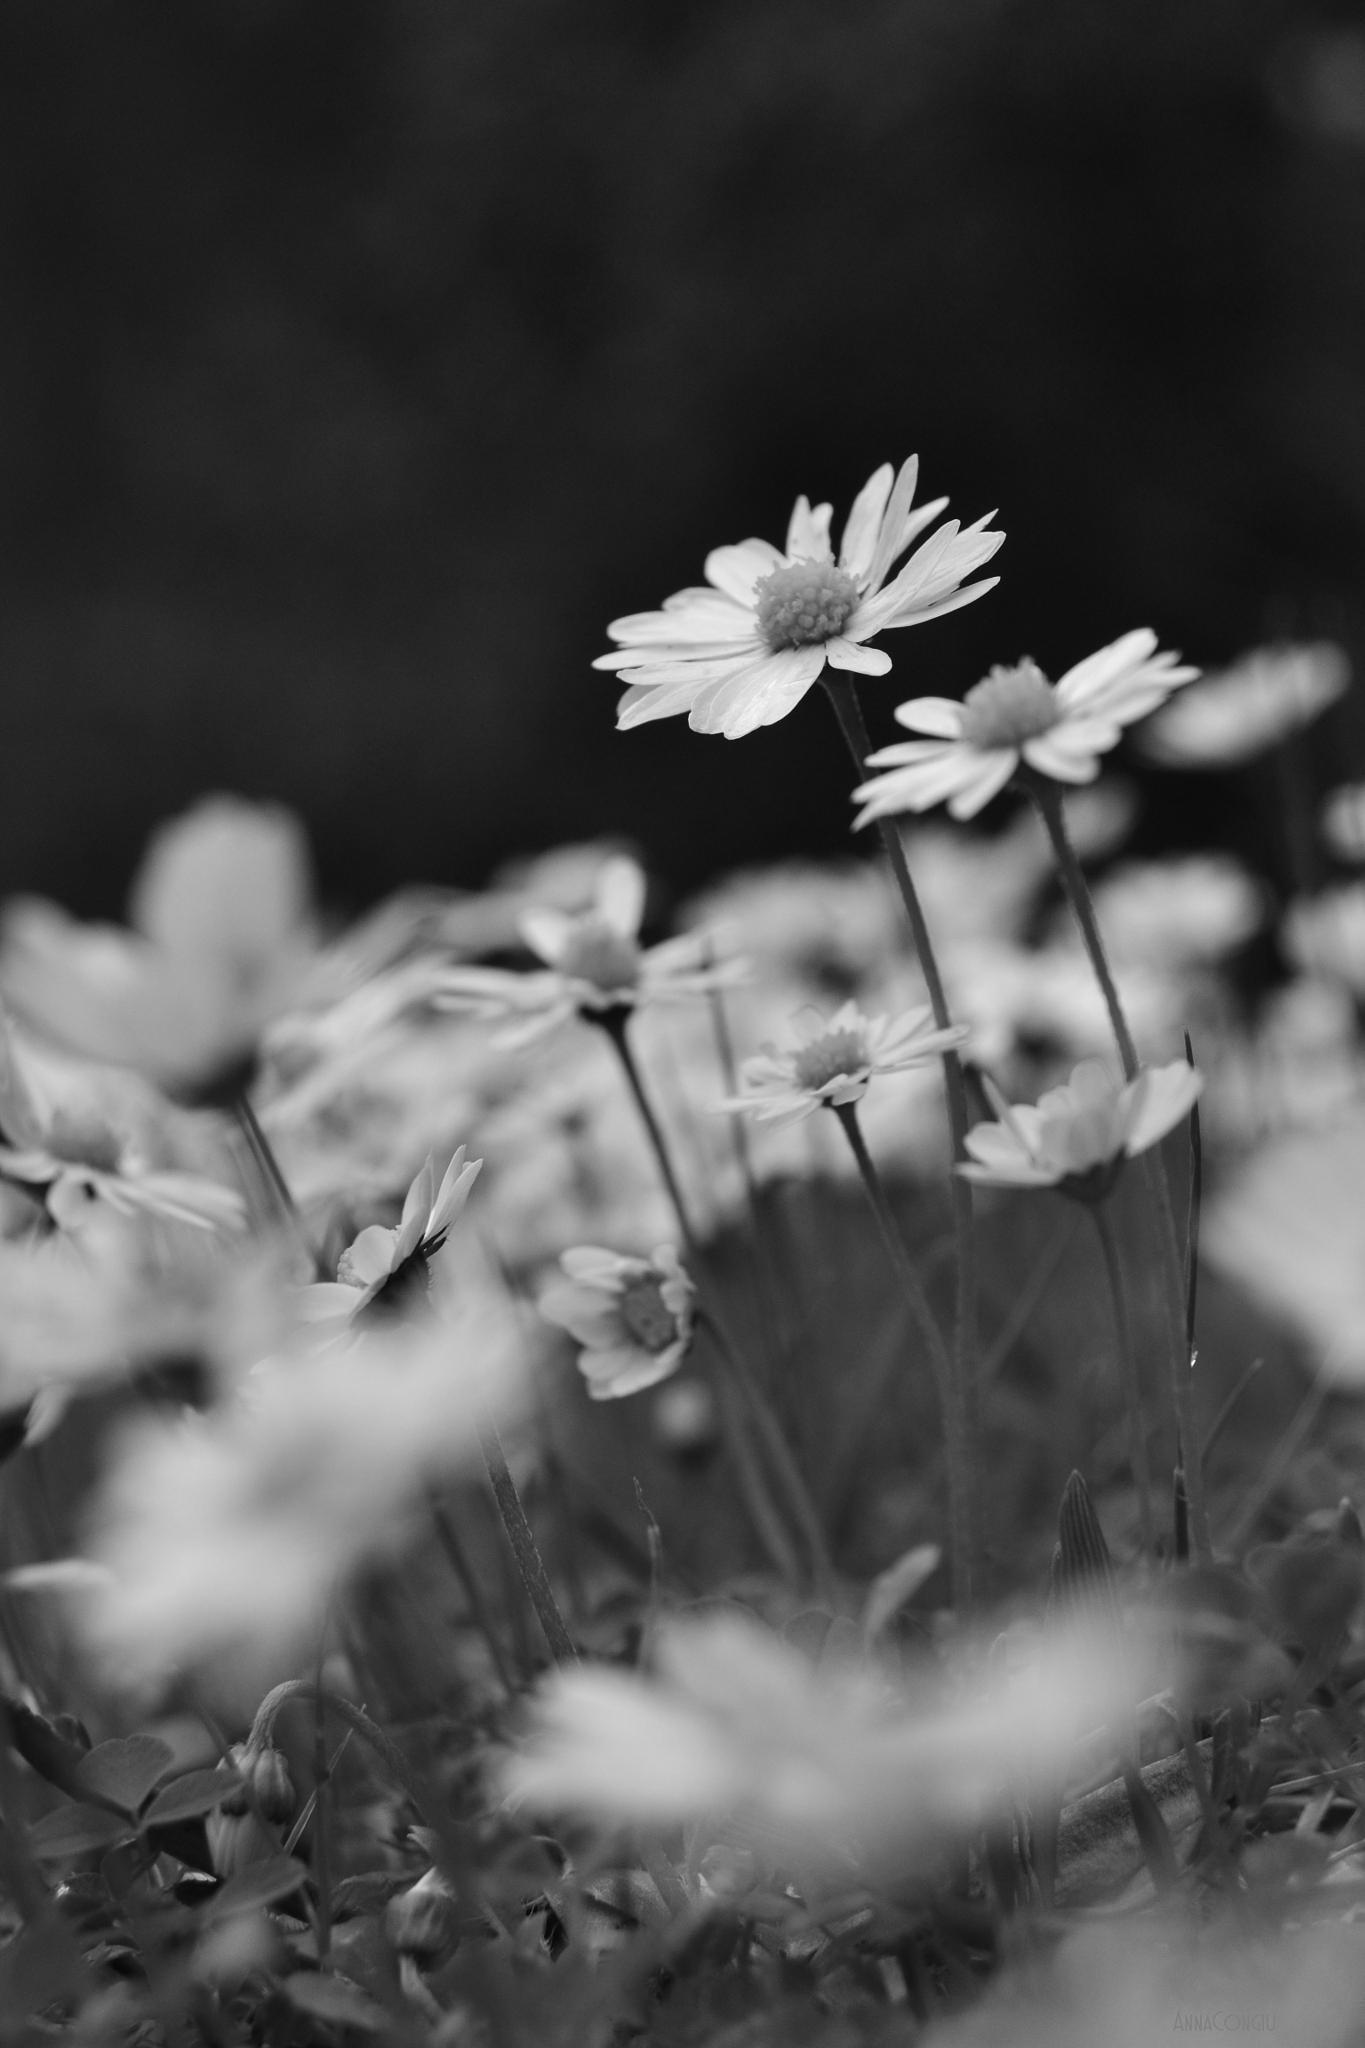 Untitled by Anna Congiu